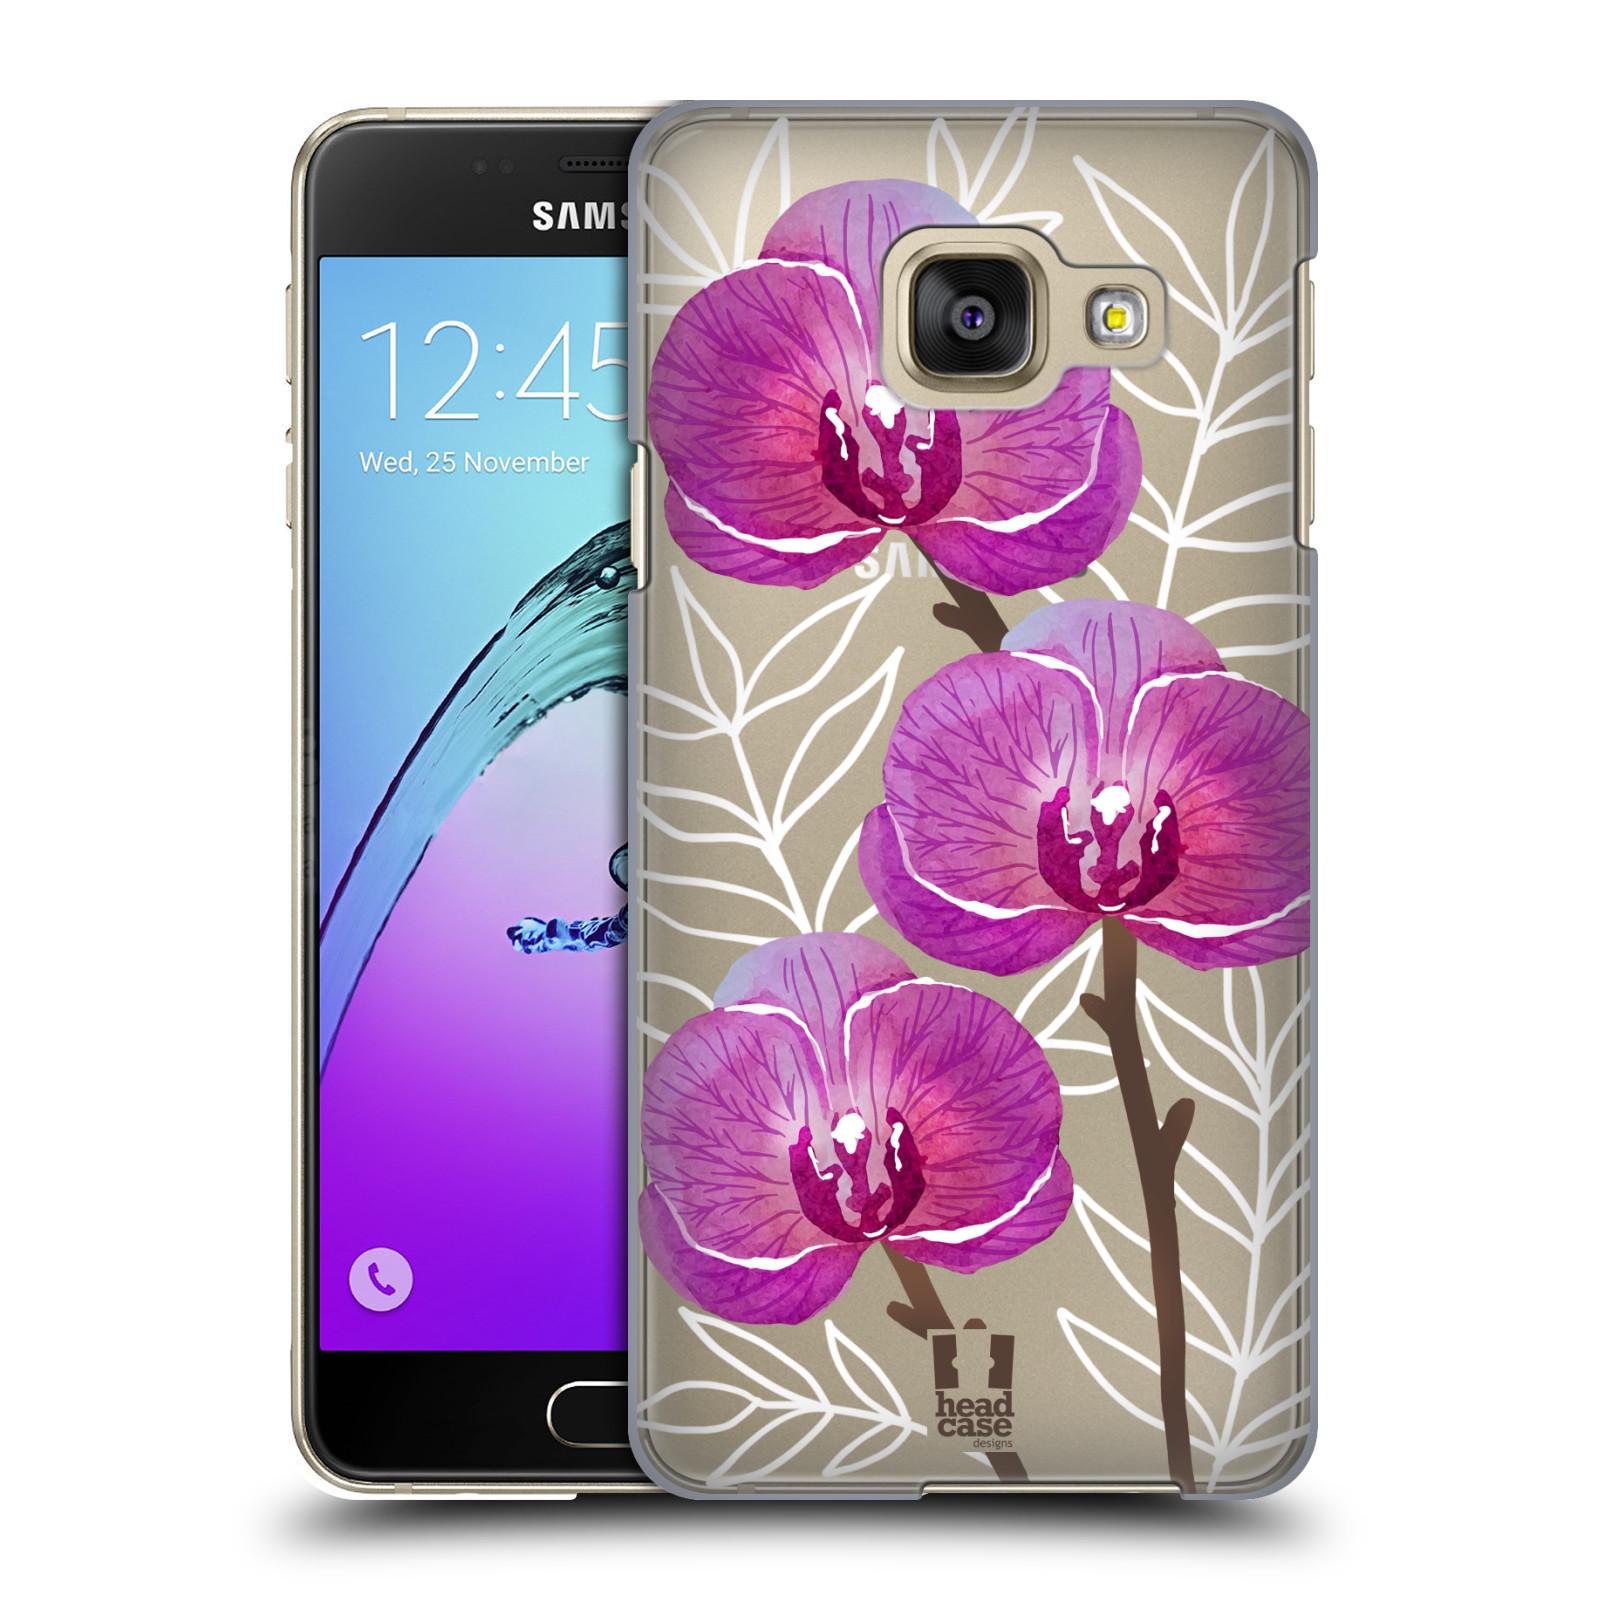 Plastové pouzdro na mobil Samsung Galaxy A3 (2016) - Head Case - Hezoučké kvítky - průhledné